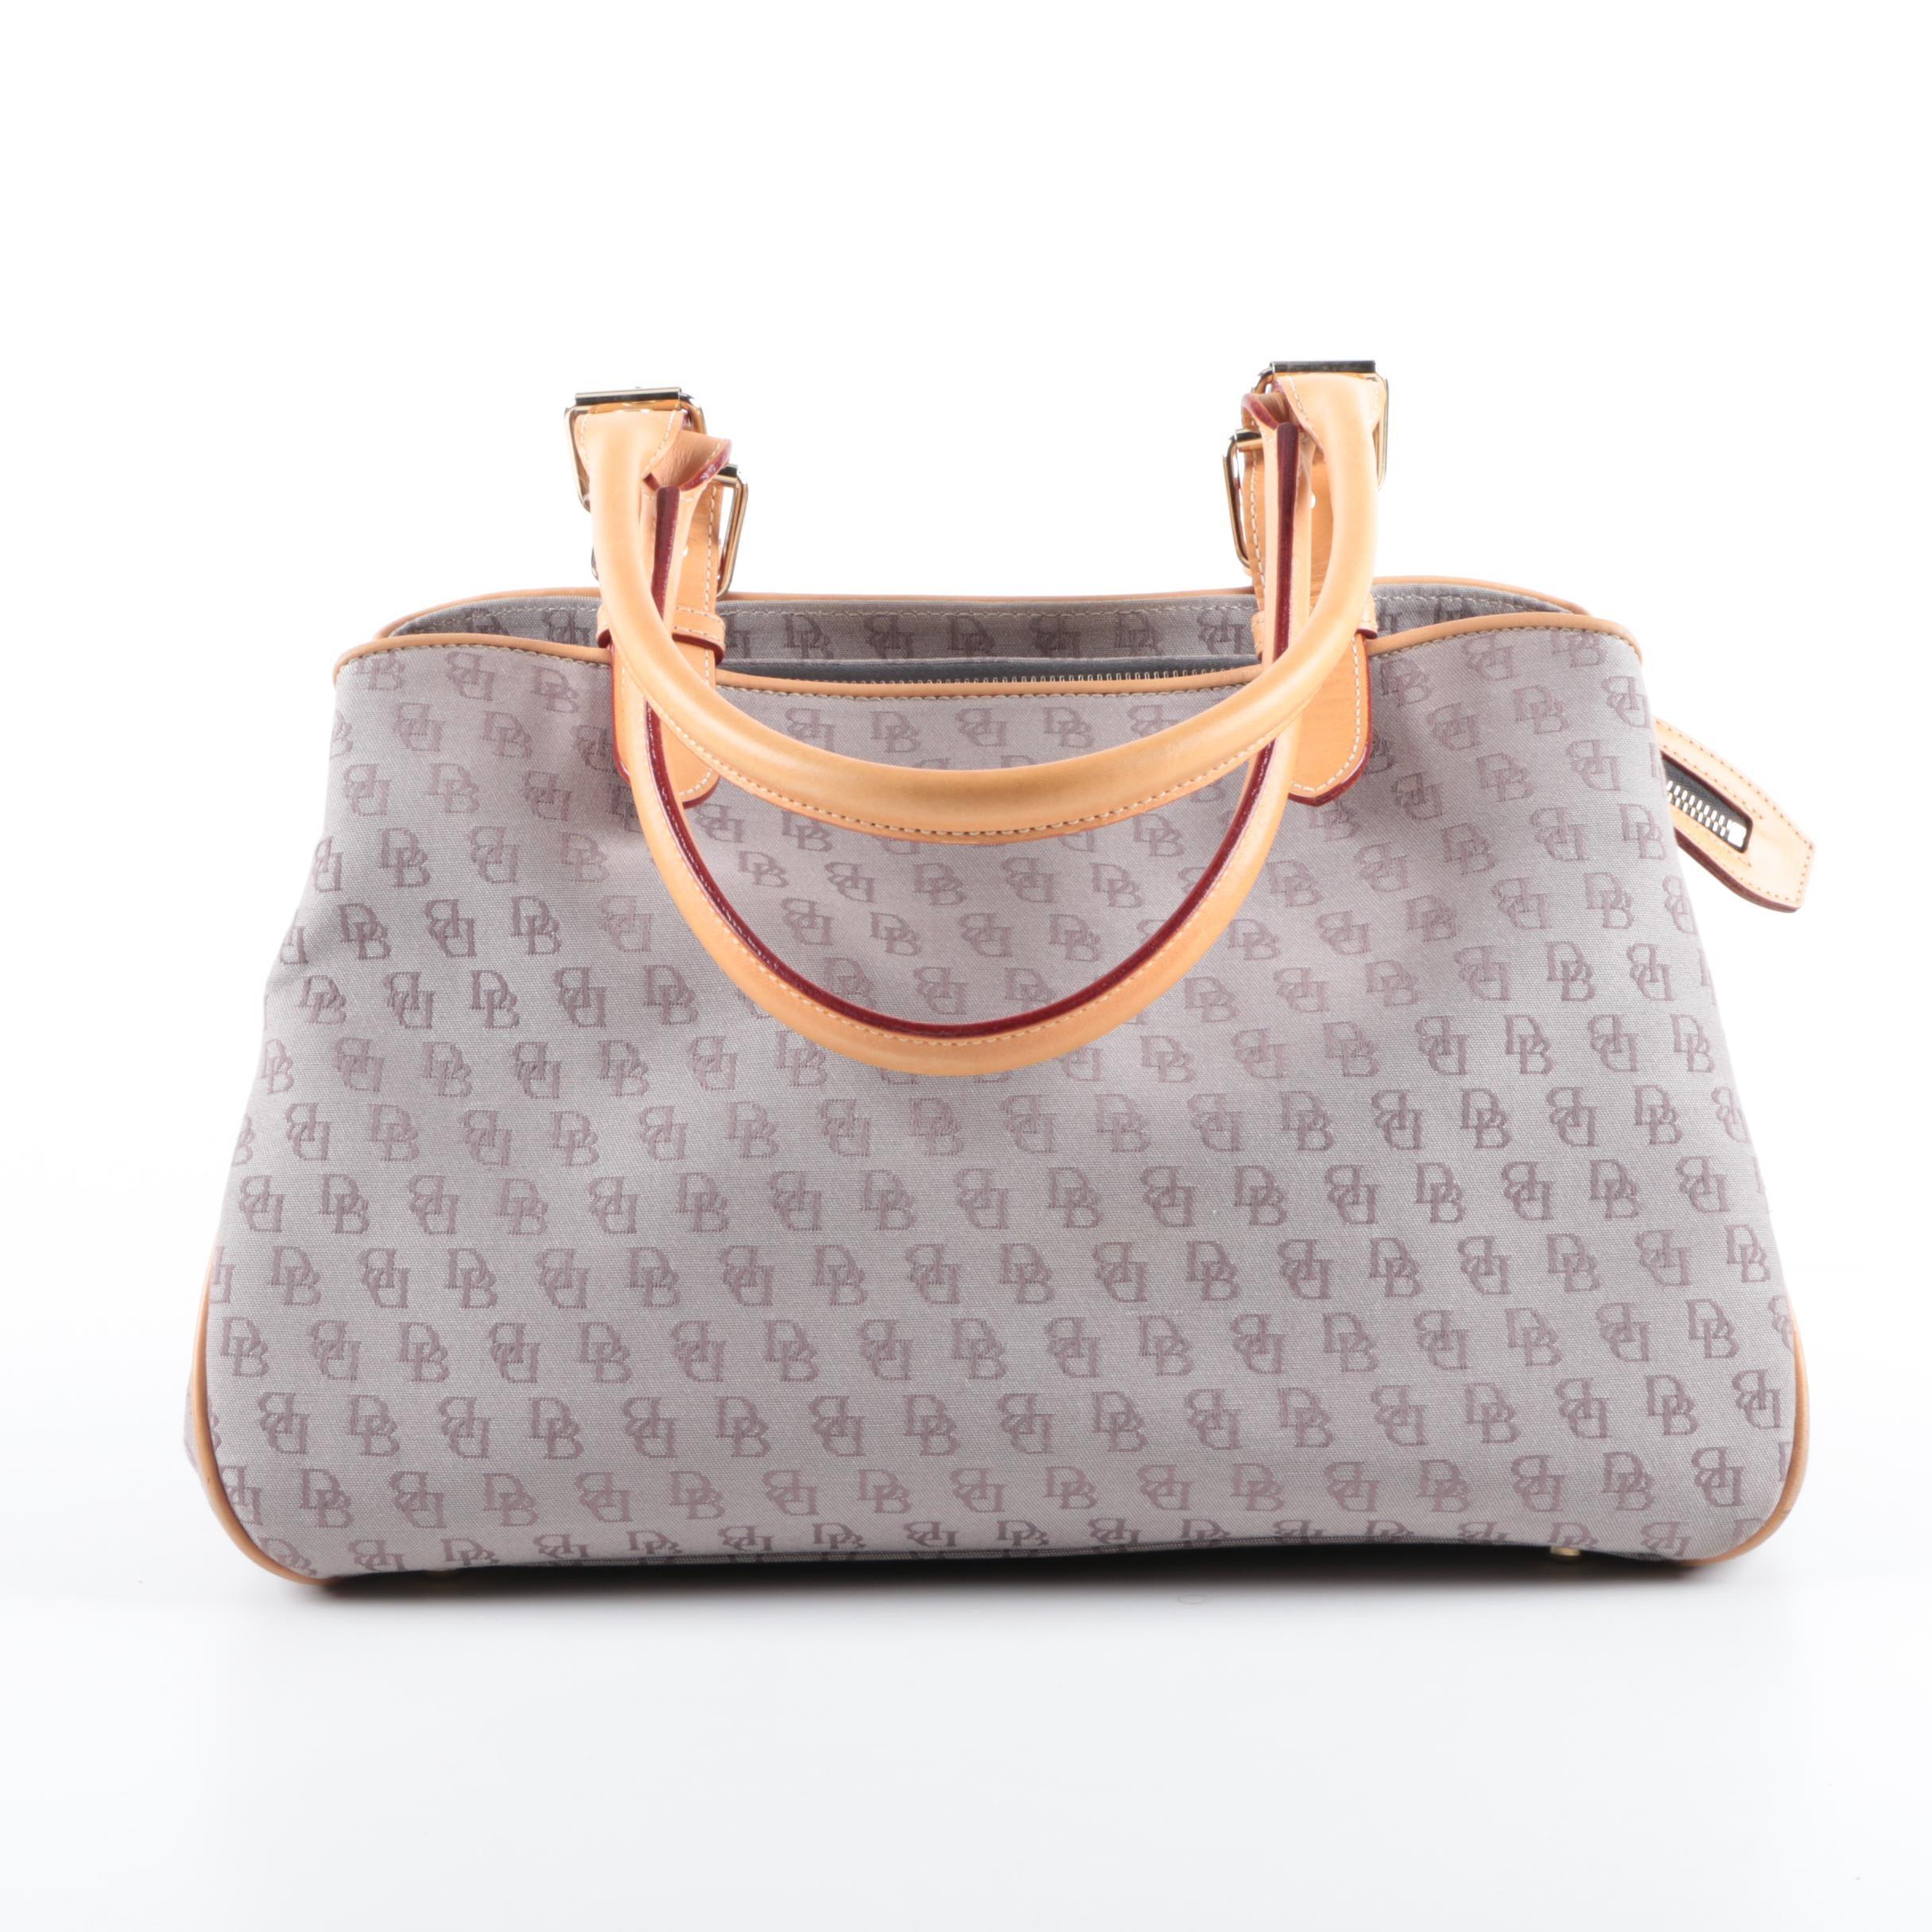 Dooney & Bourke Signature Canvas Top Handle Carryall Bag